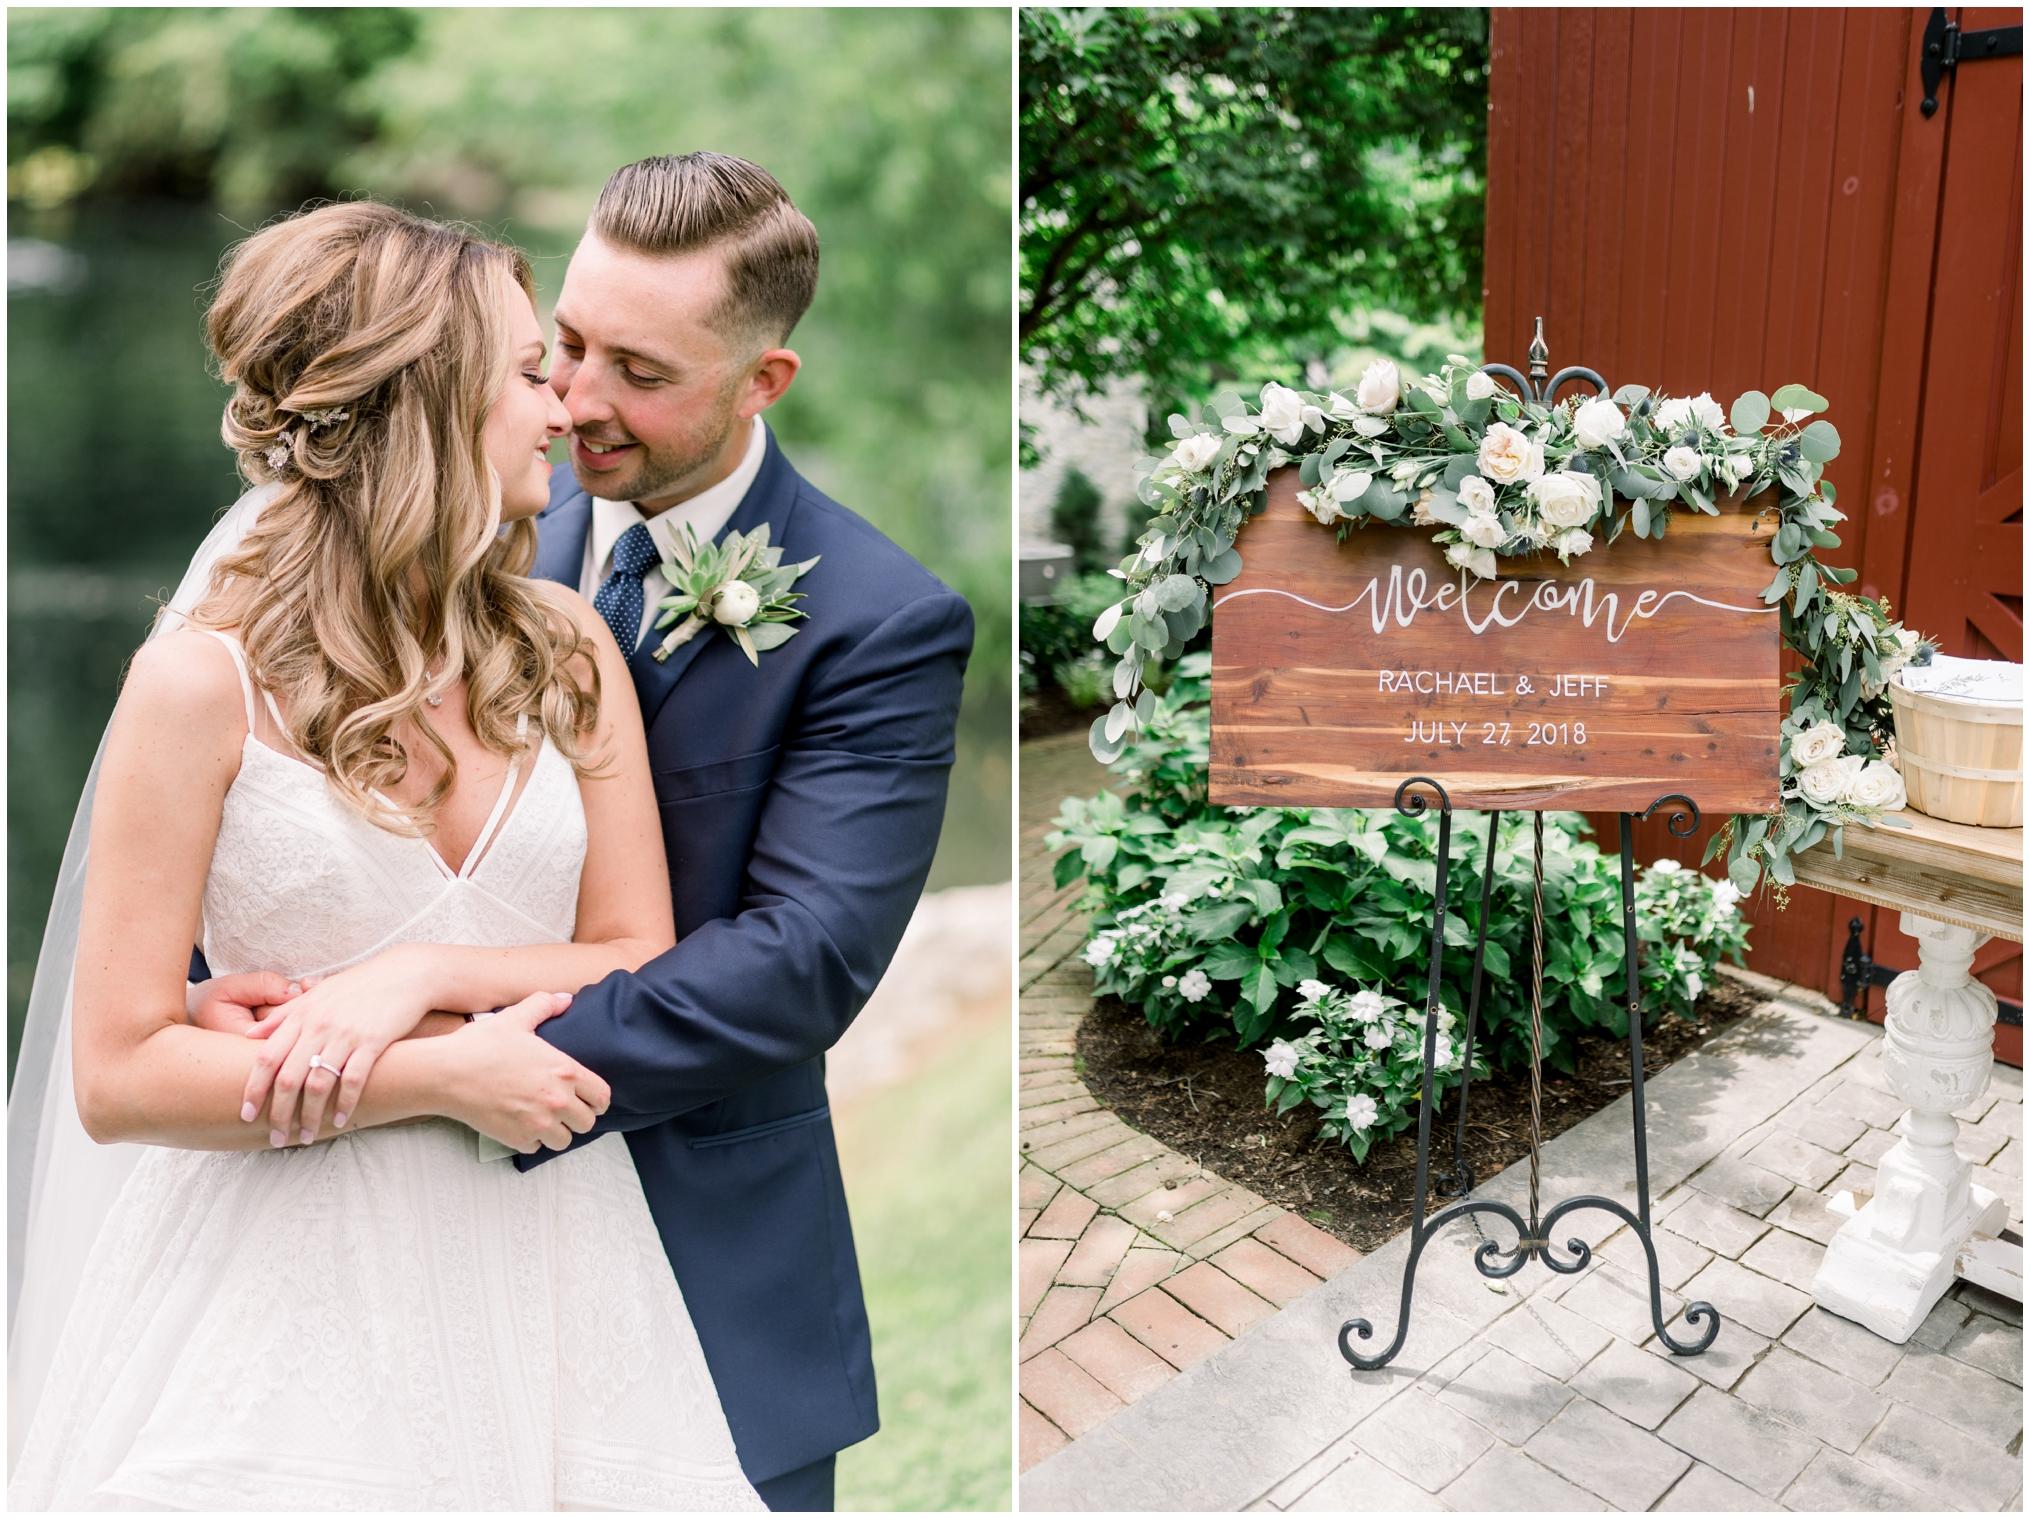 Krista Brackin Photography | July Wedding at The Farm at Eagle's Ridge_0015.jpg